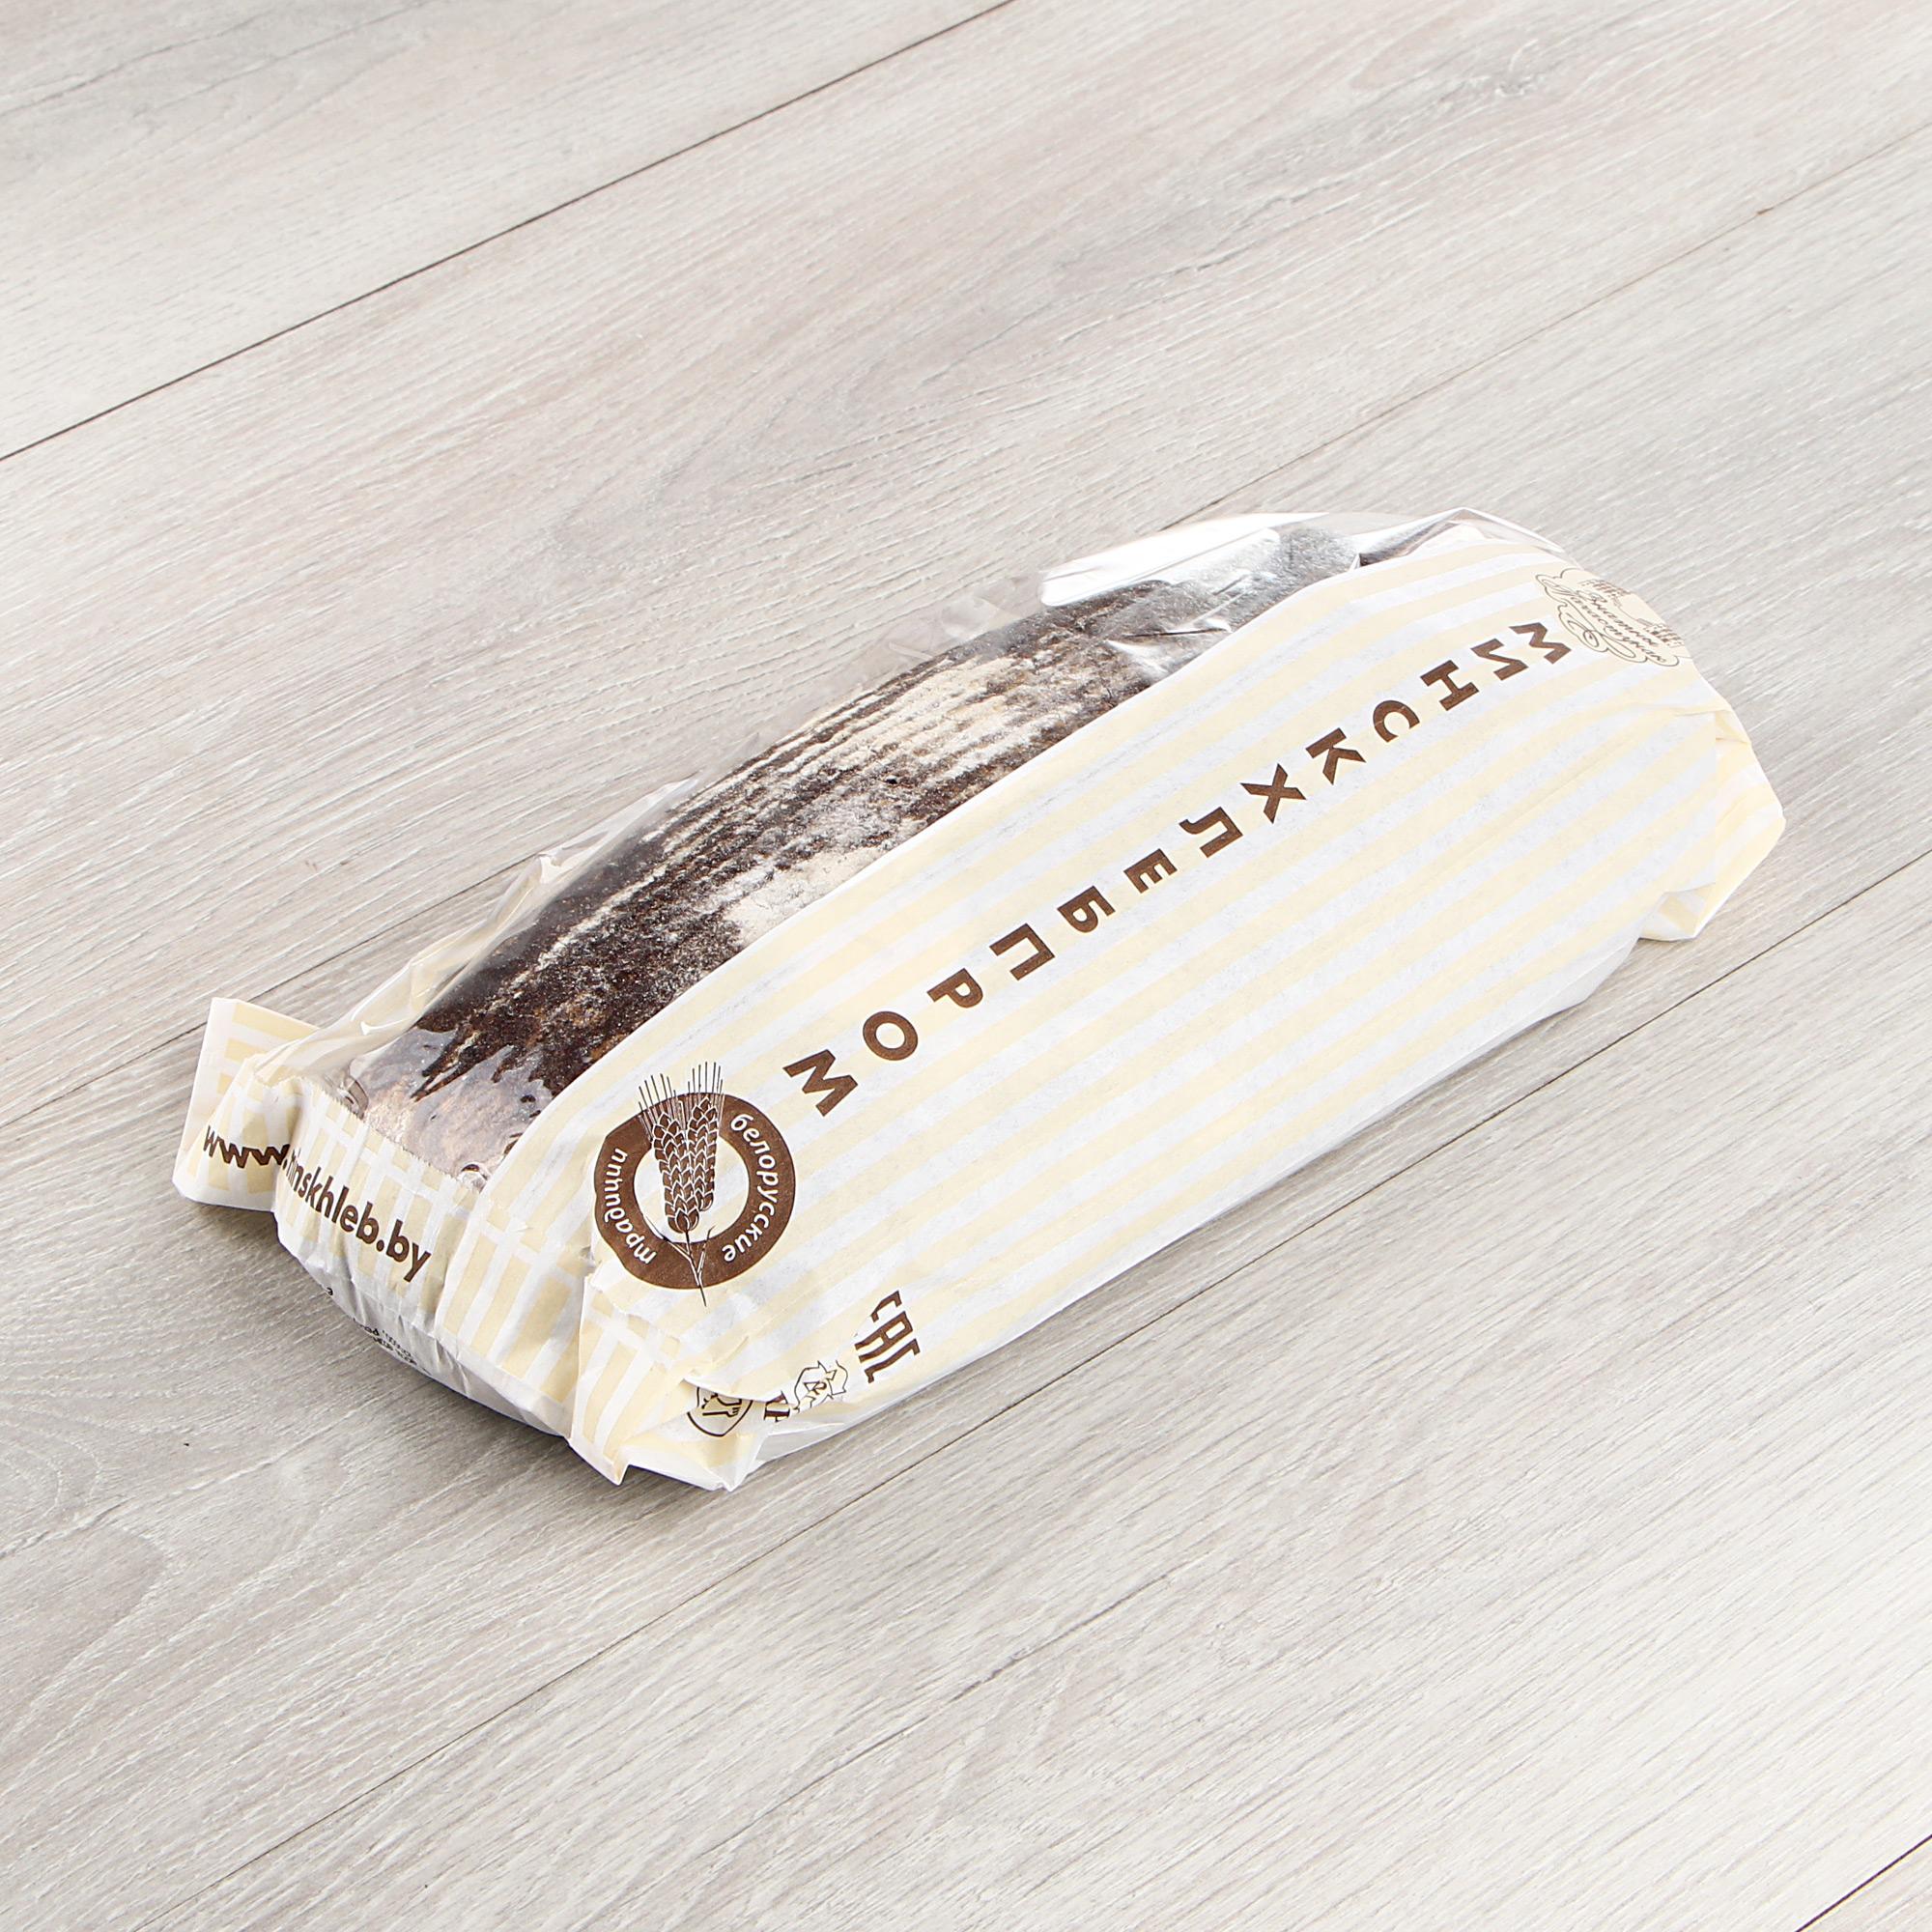 Хлеб Знатные Отрада подовый 1,2 кг аглая отрада судьба по наследству